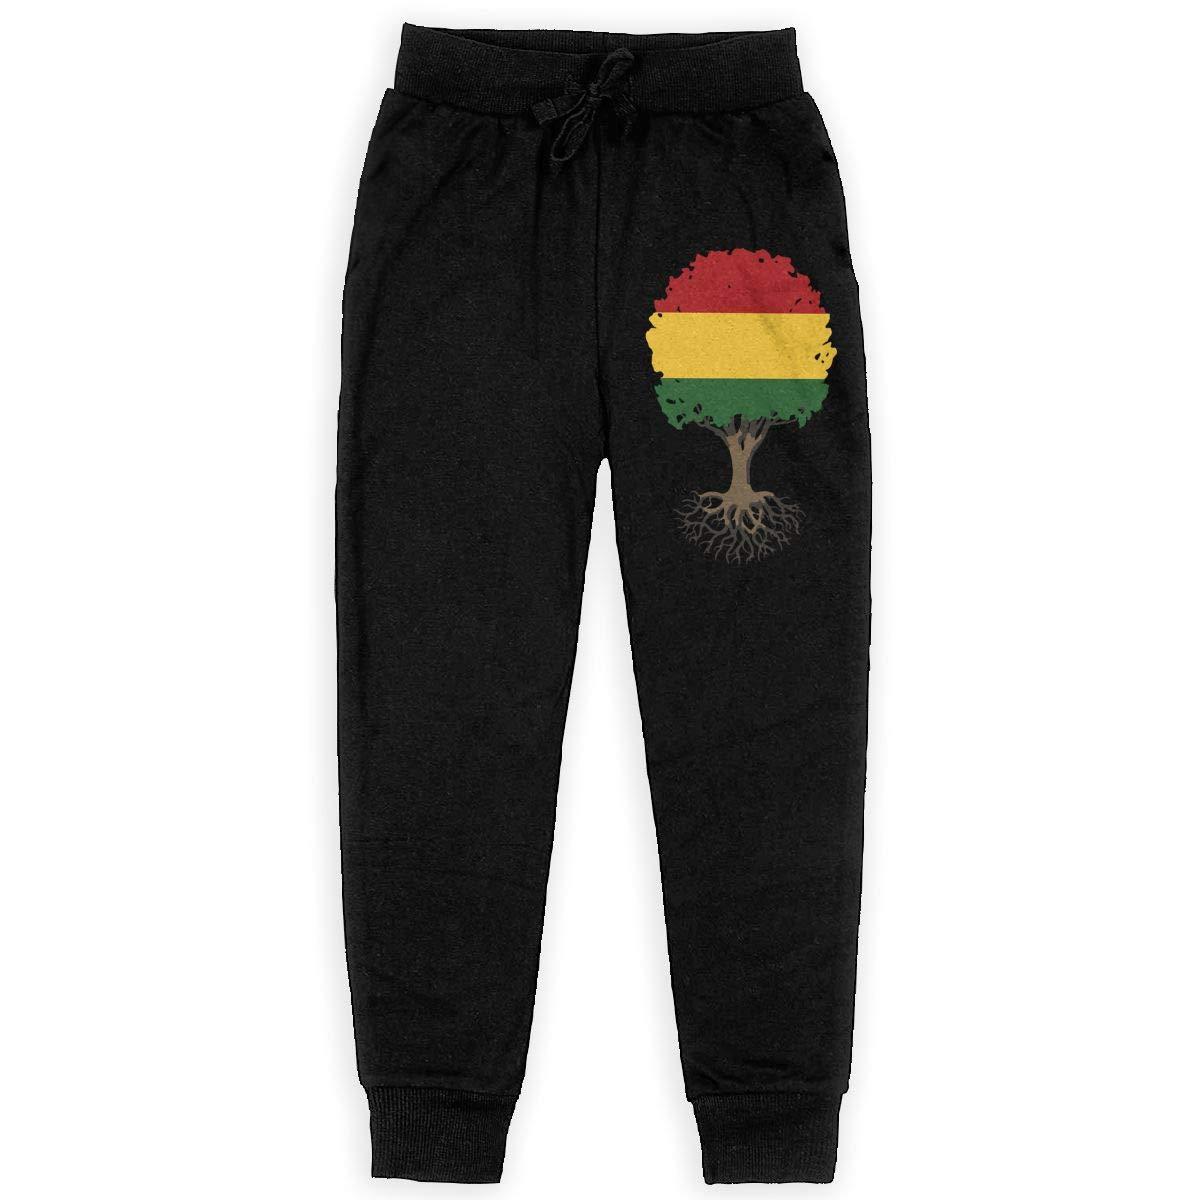 WYZVK22 Tree of Life with Rasta Flag Soft//Cozy Sweatpants Boys Fleece Pants for Teen Boy